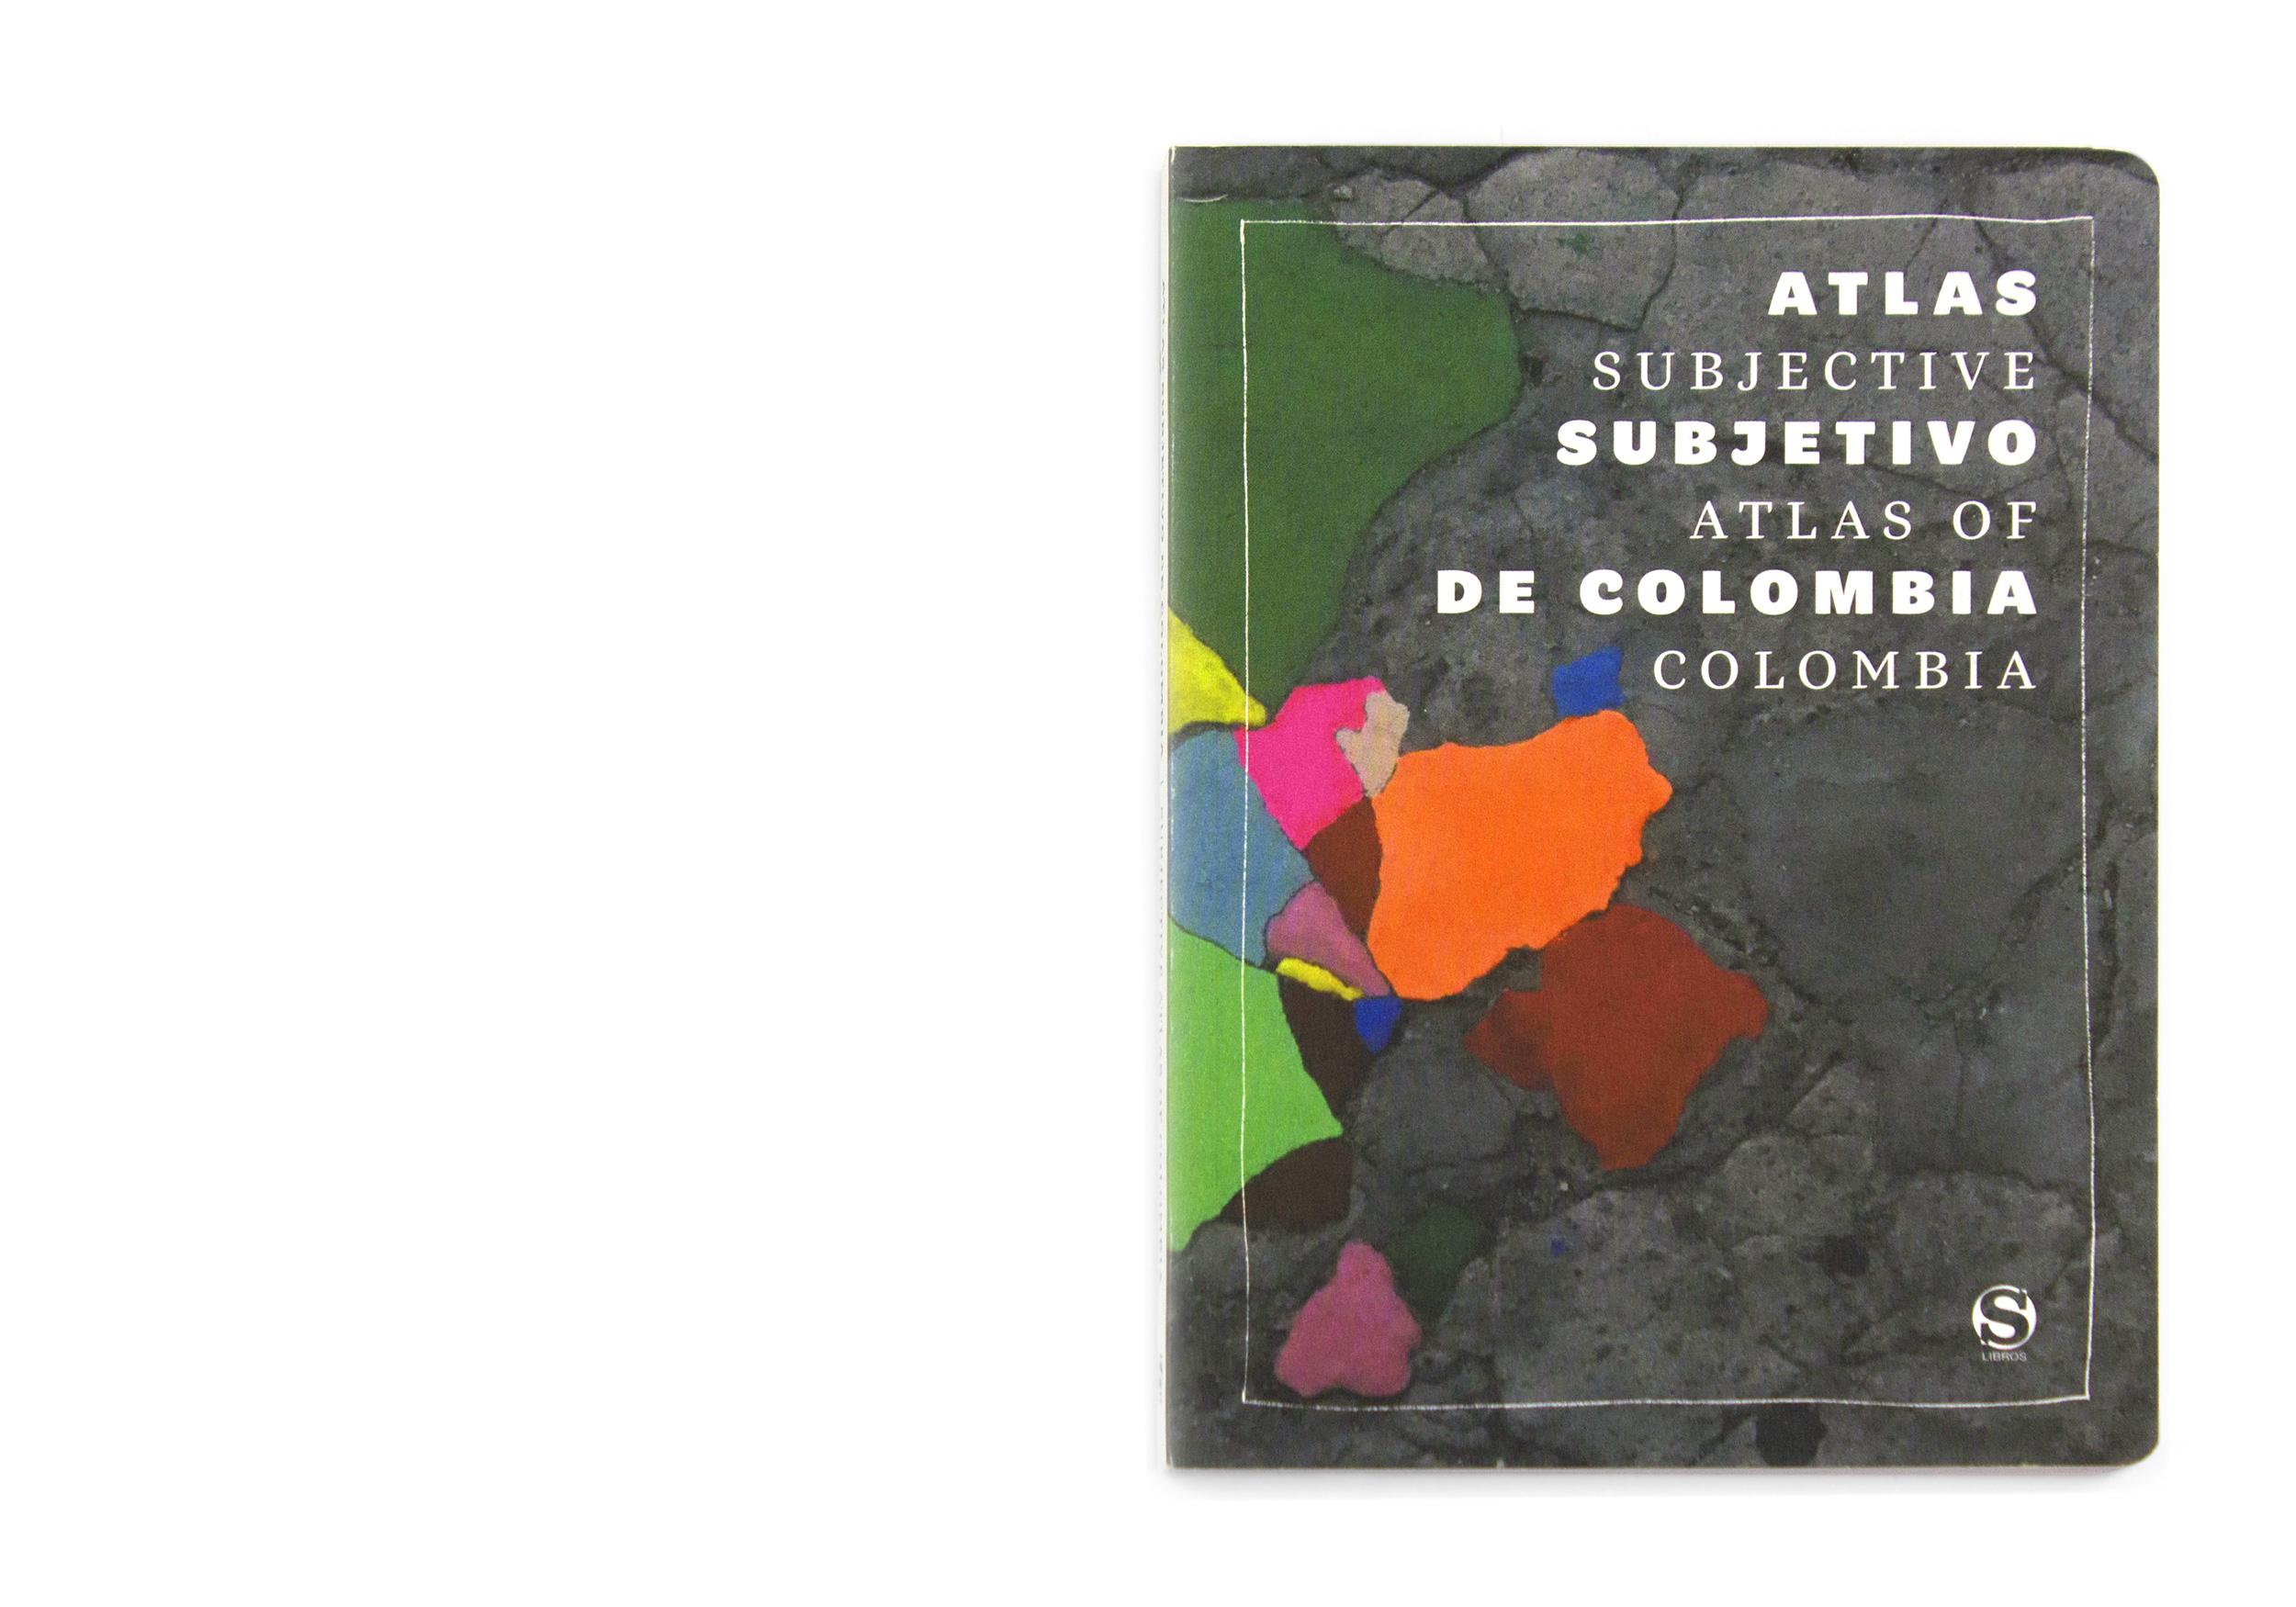 SubjectiveAtlasColombia_01.jpg